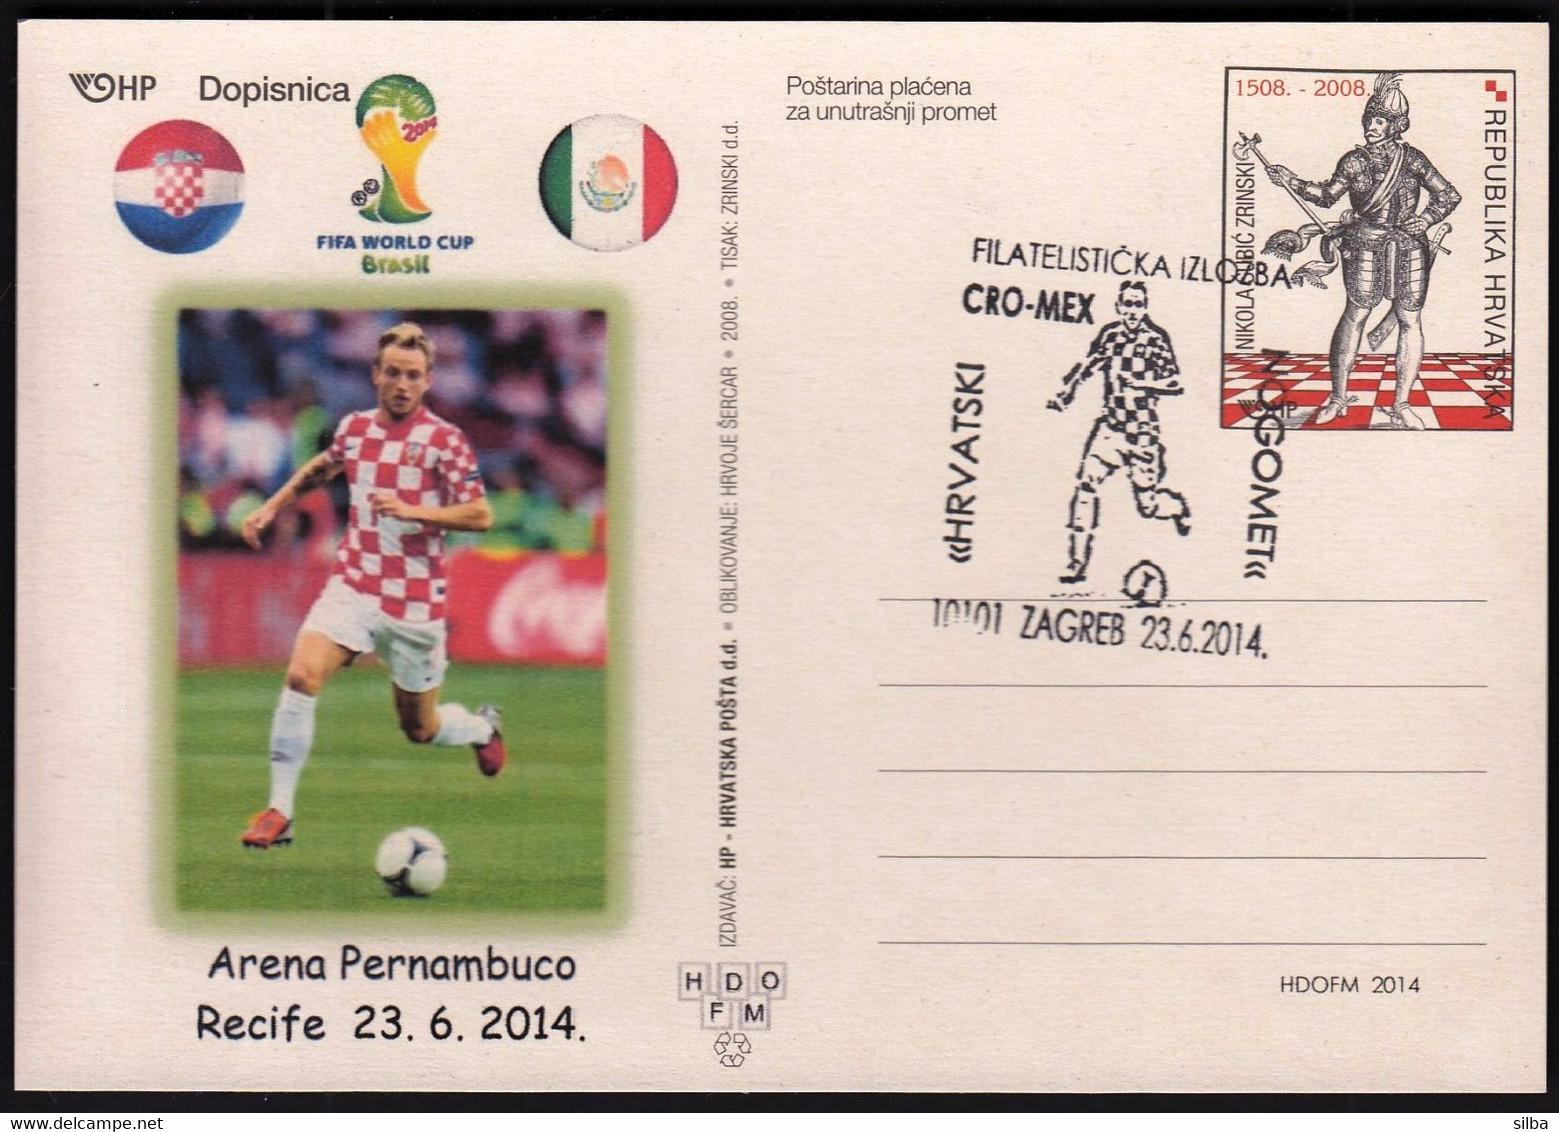 Croatia Zagreb 2014 / Soccer Football / World Championship Brazil 2014 / Ph. Ex. Croatian Football / Croatia - Mexico - 2014 – Brasil